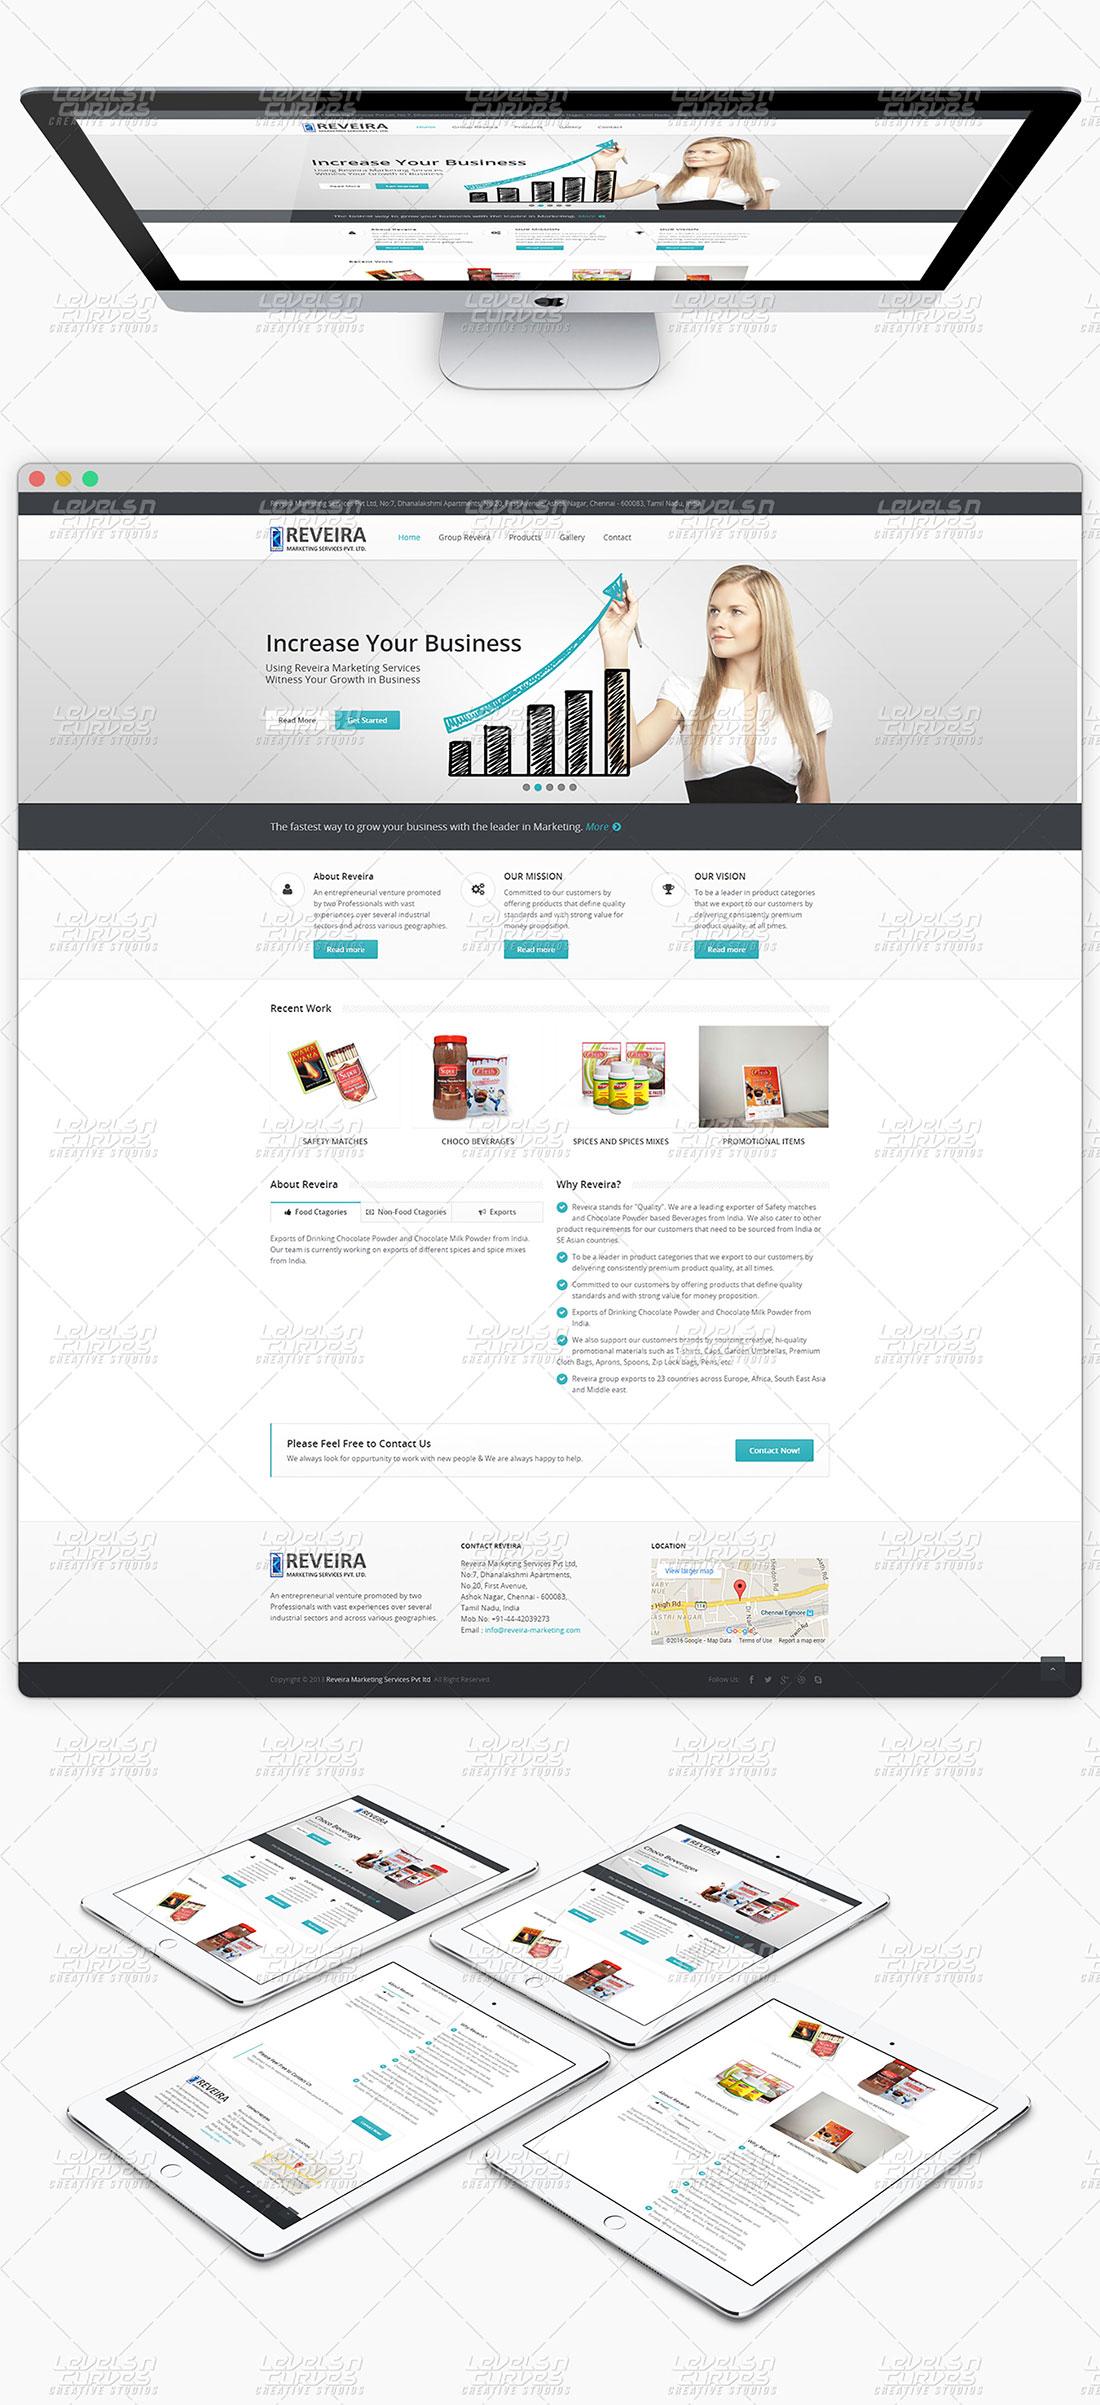 Branding and print design